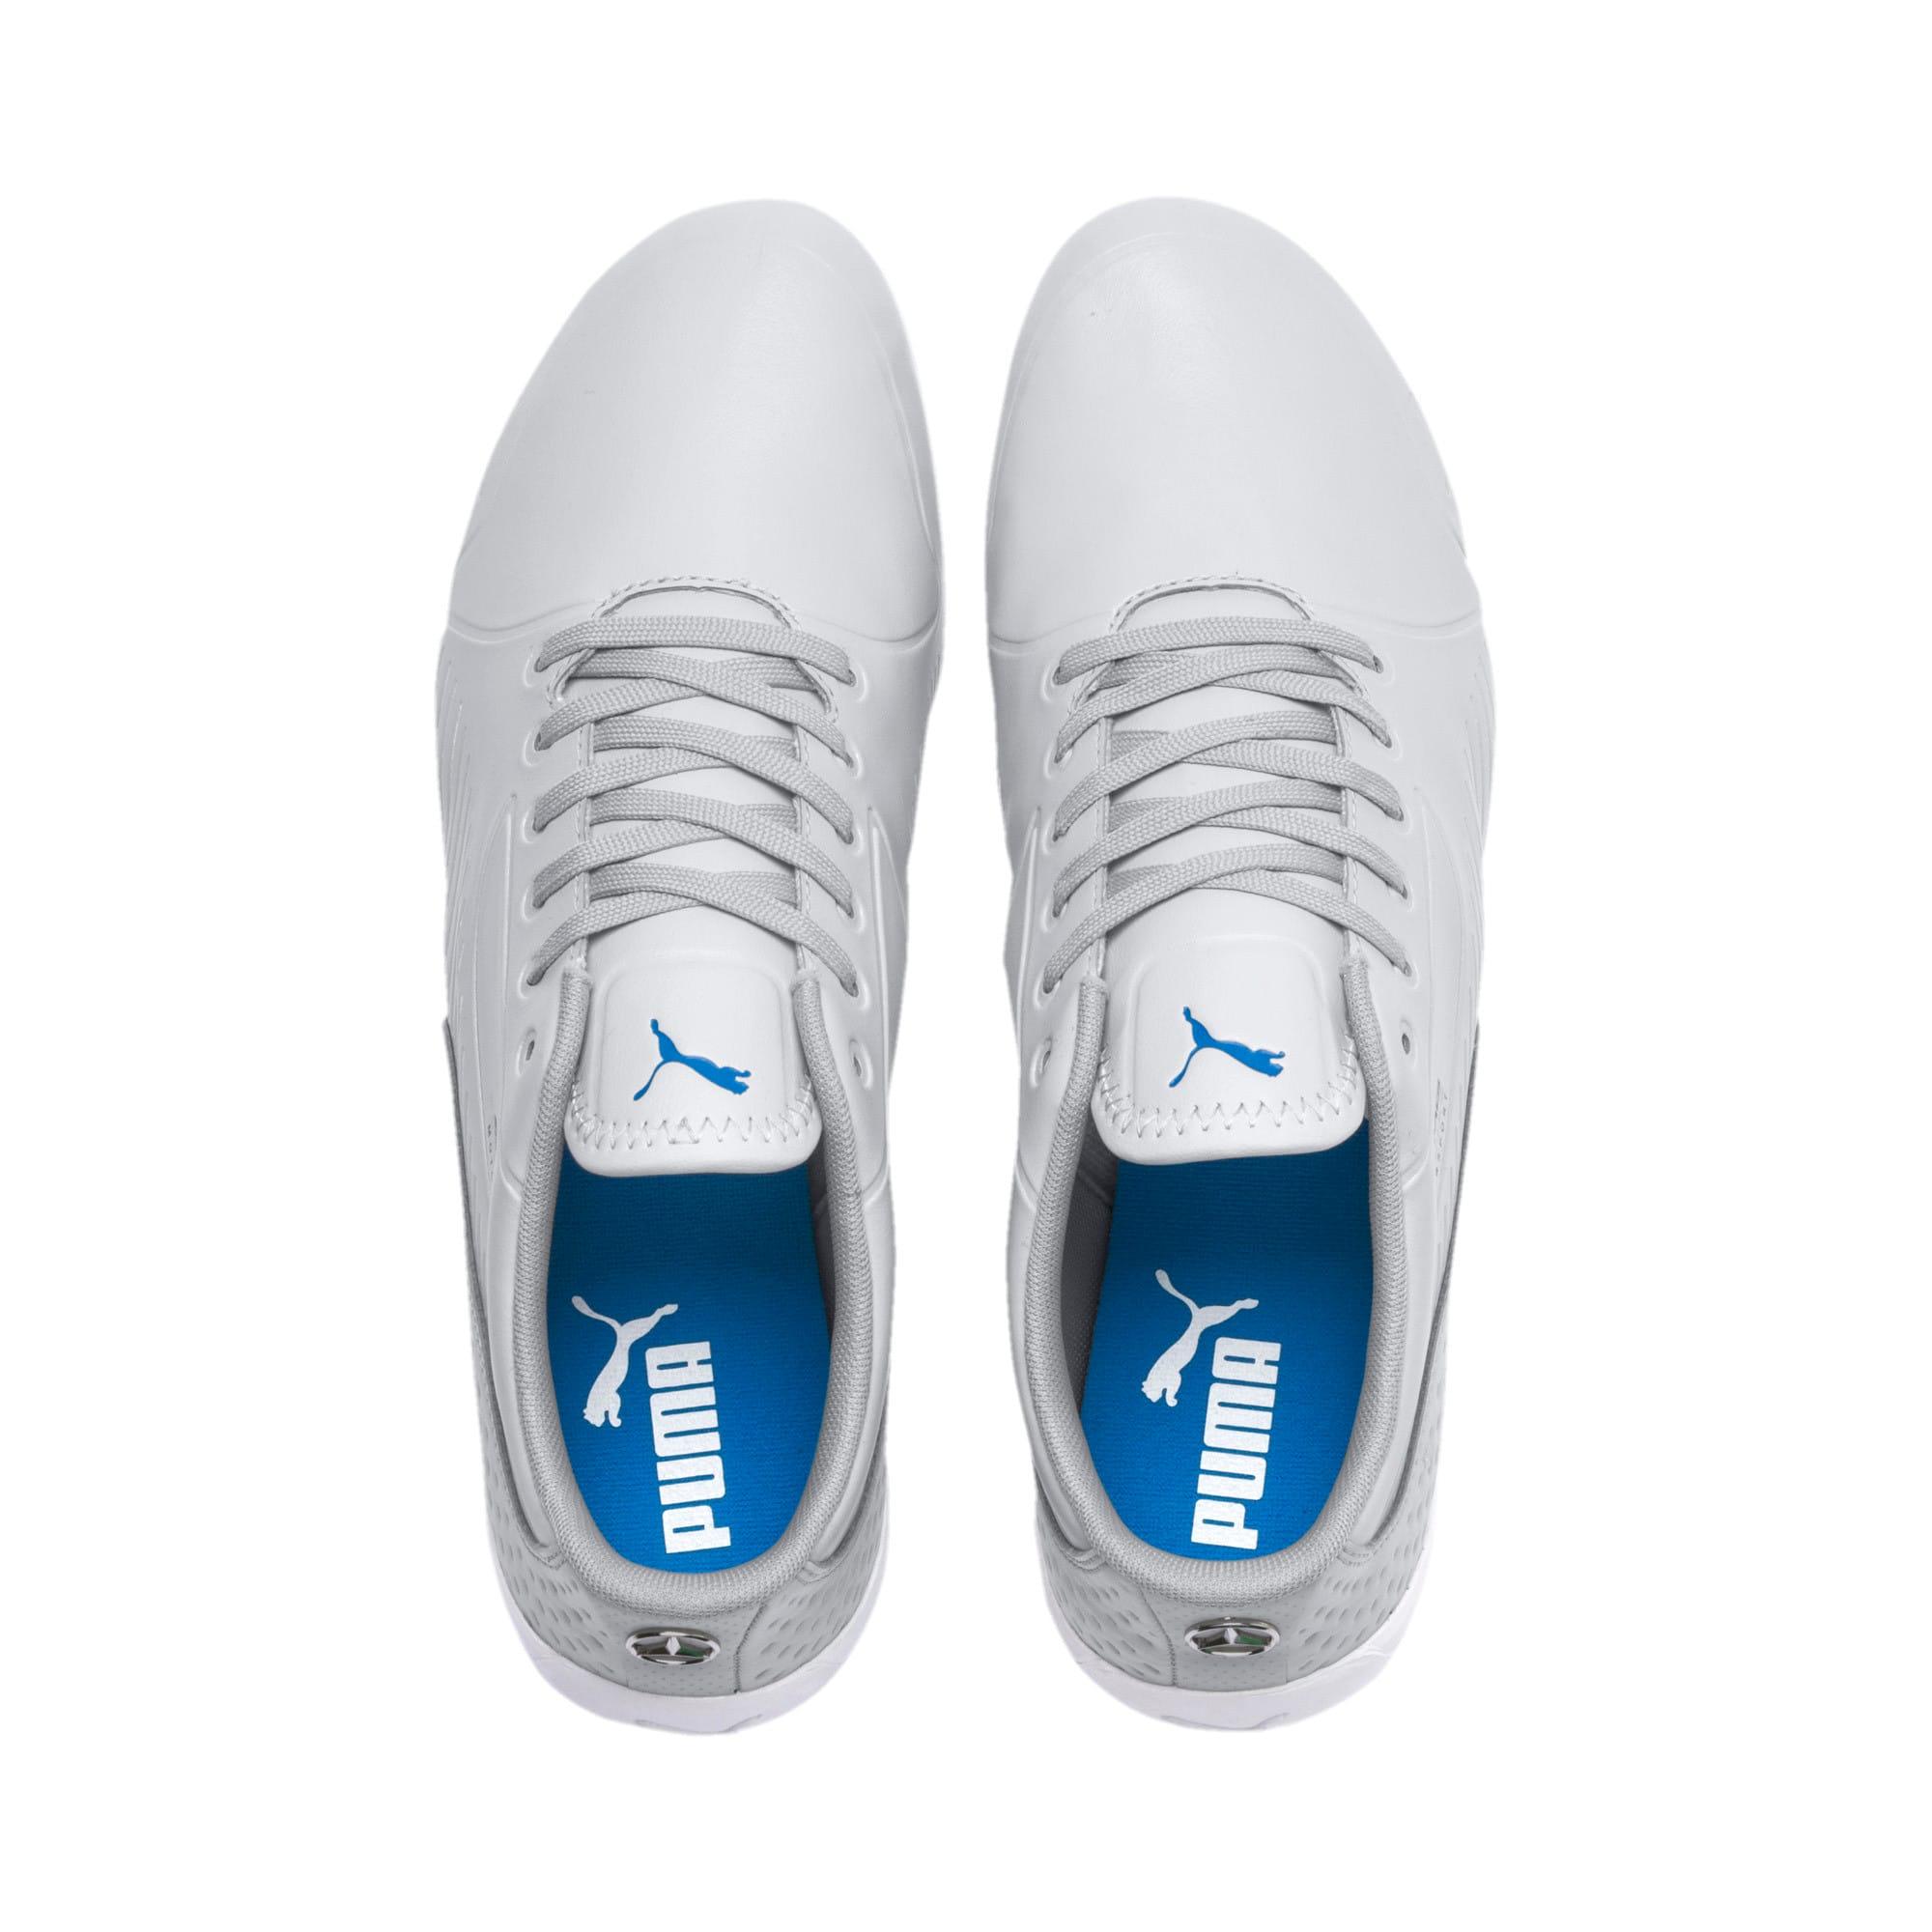 Thumbnail 6 of Mercedes AMG Petronas Drift Cat 7S Ultra Men's Shoes, Mercedes Team Silver-White, medium